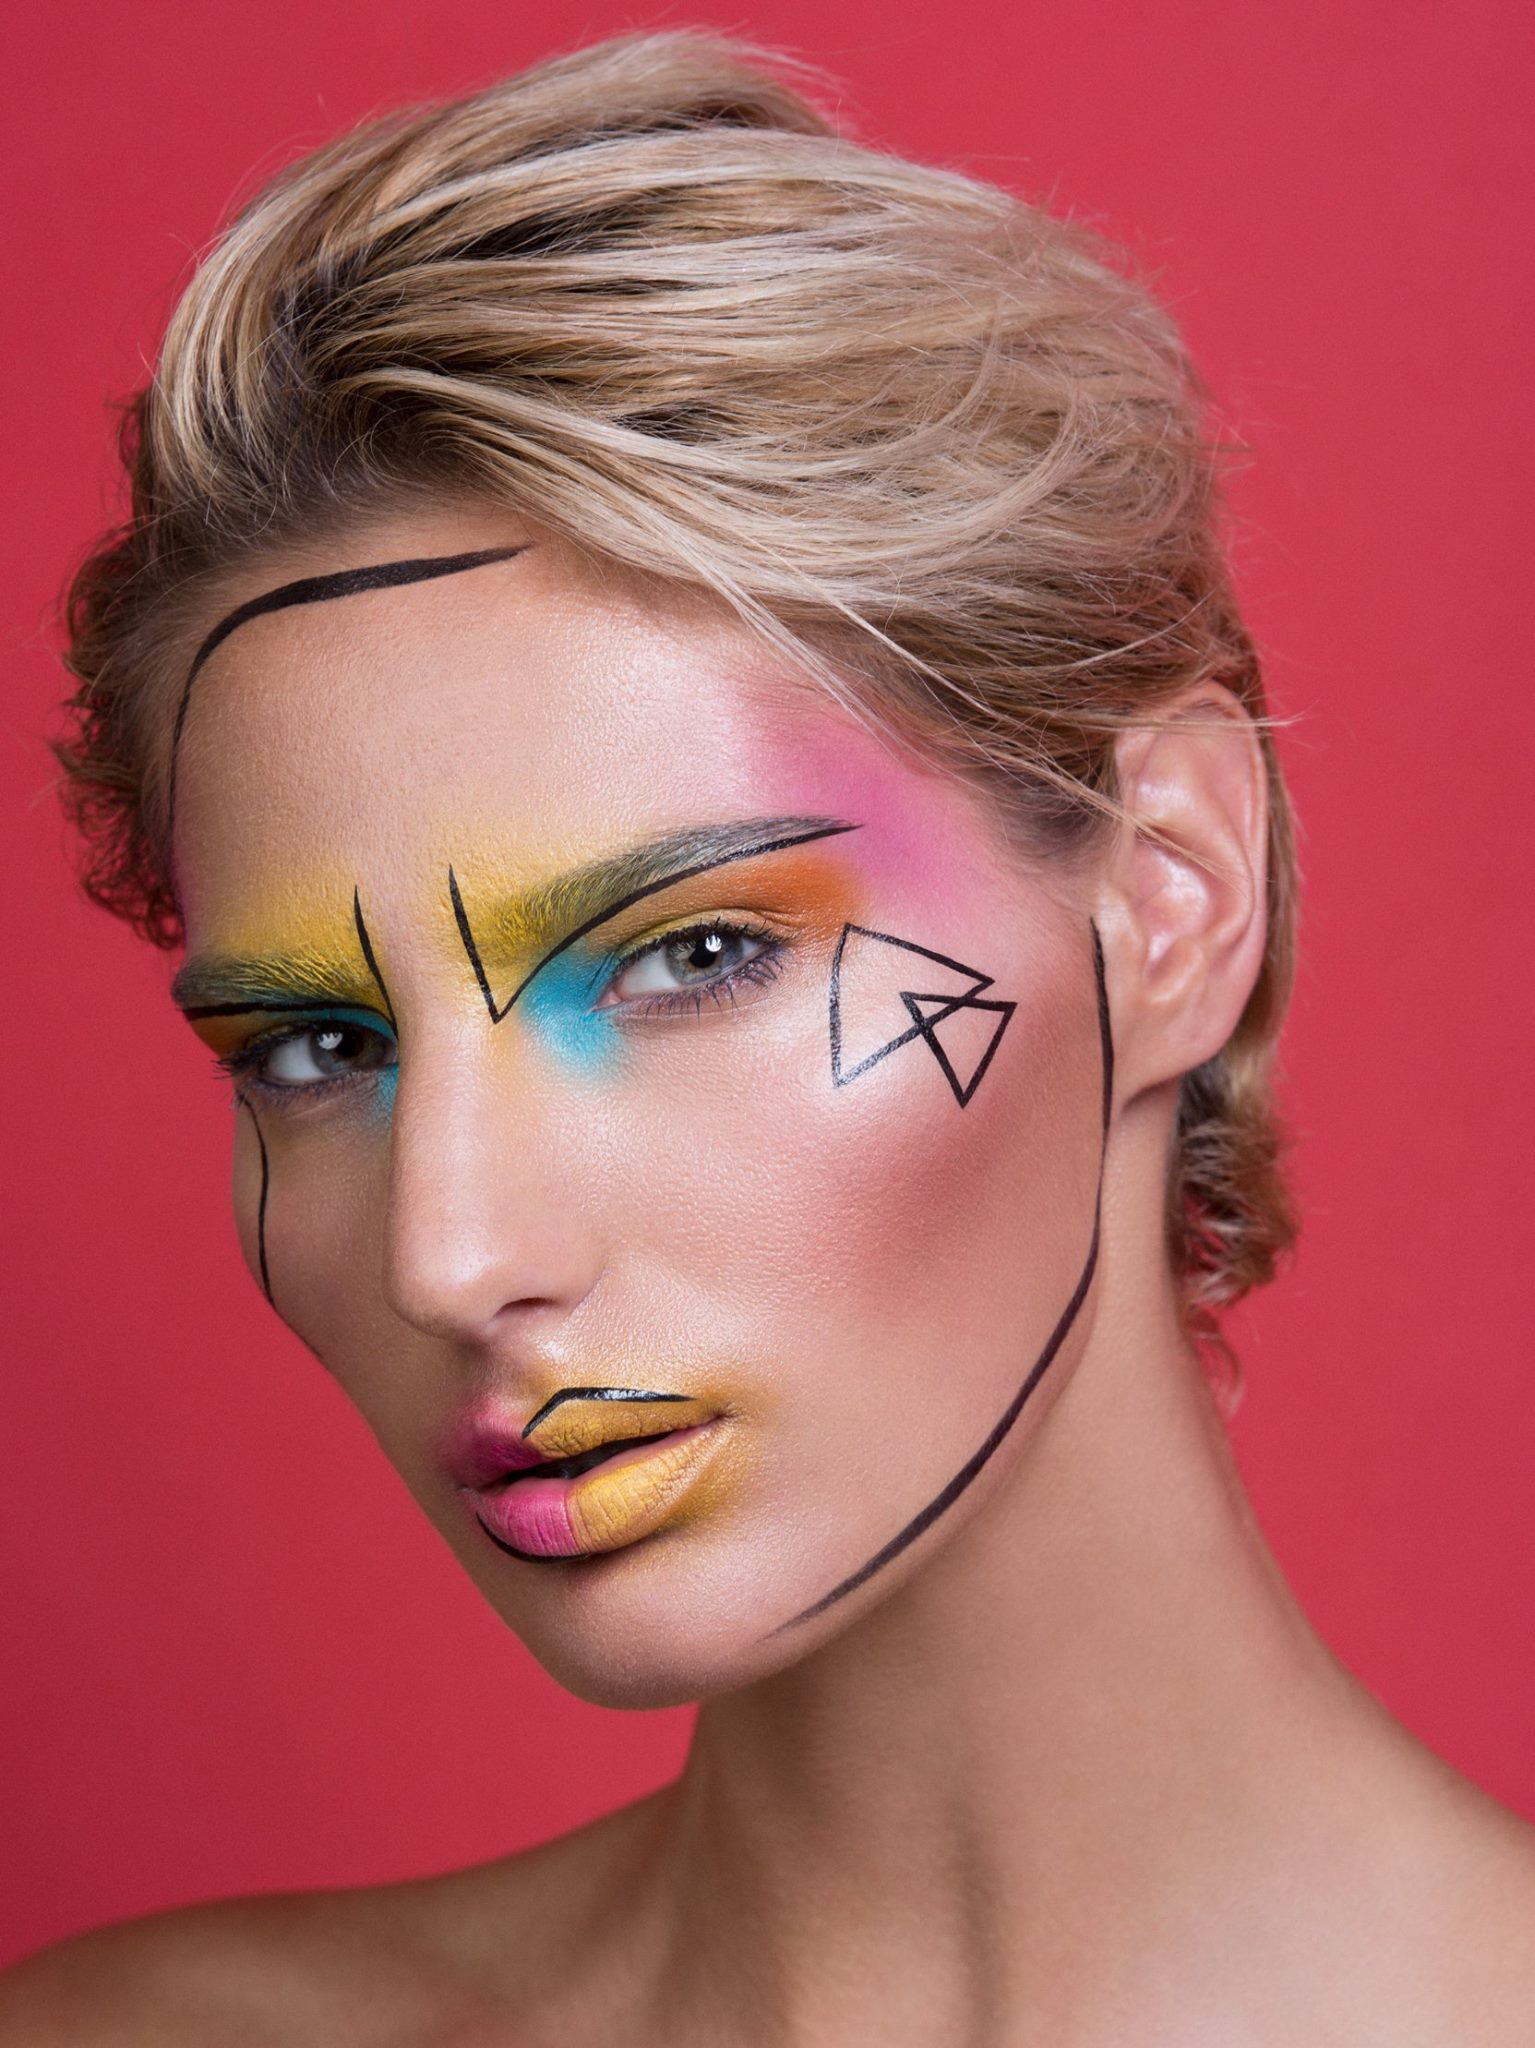 Creative Modern Pop Art Makeup by Jaynelle Lording